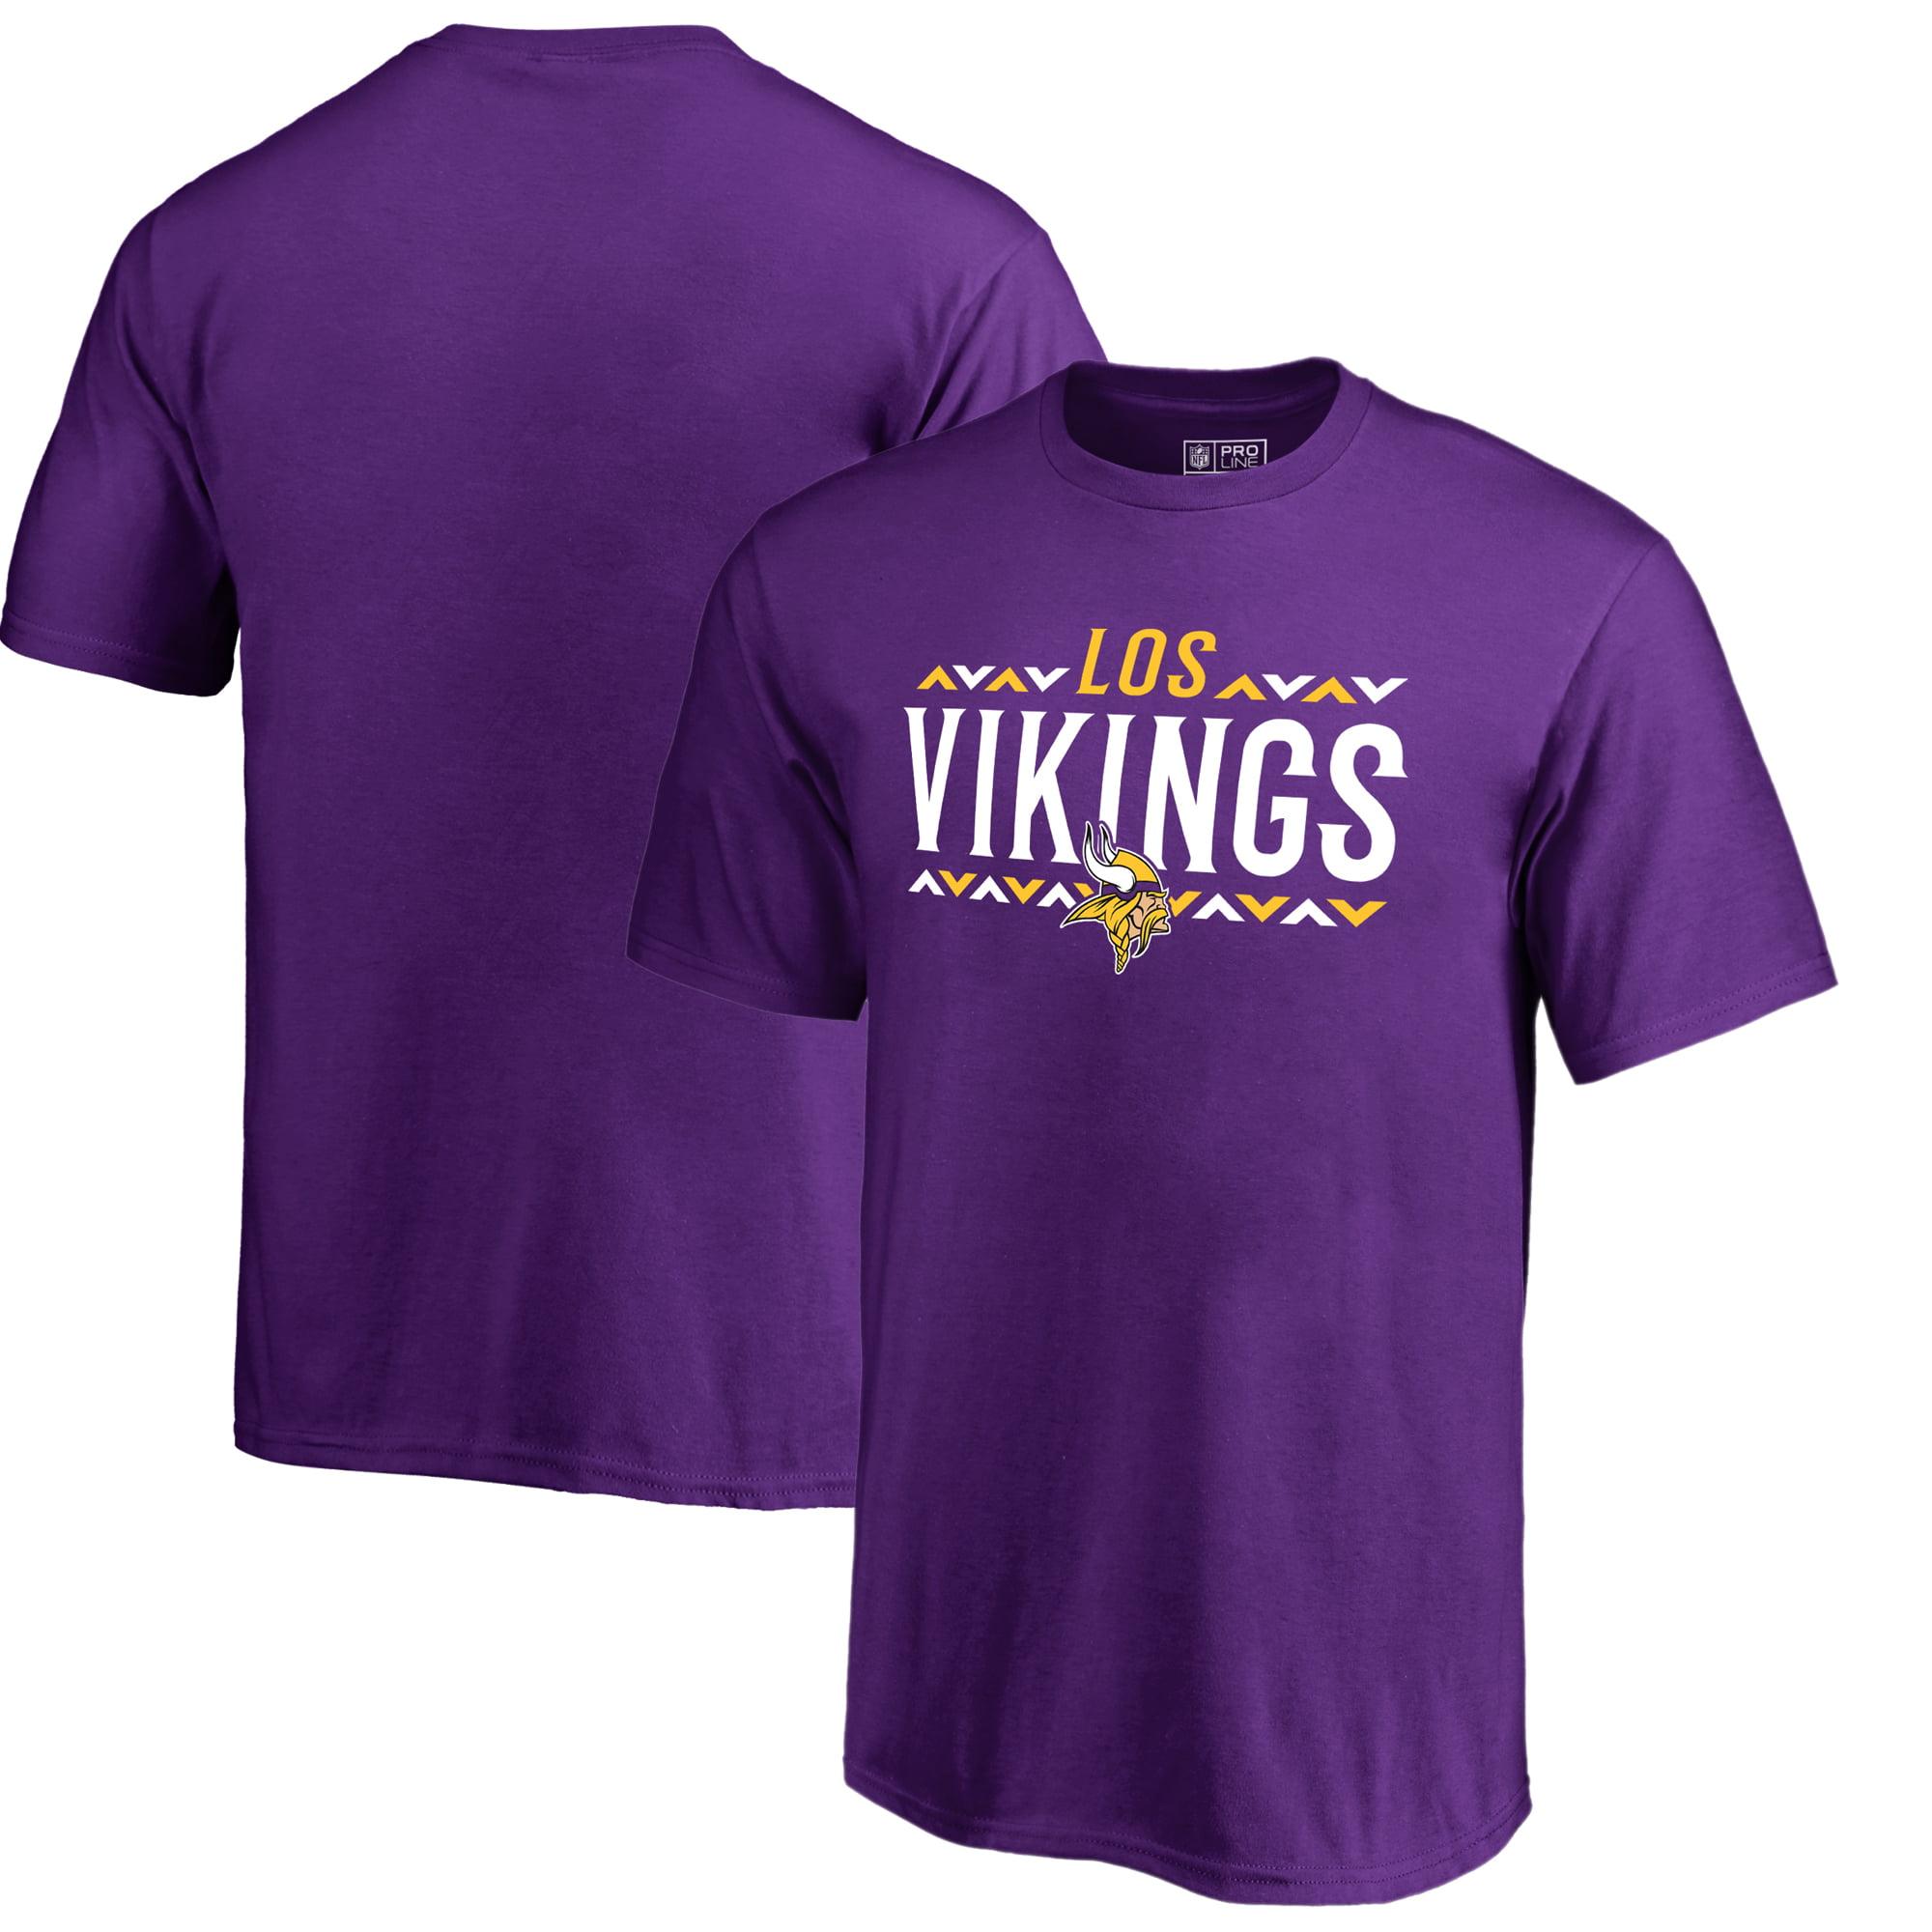 Minnesota Vikings NFL Pro Line by Fanatics Branded Youth Arriba T-Shirt - Purple